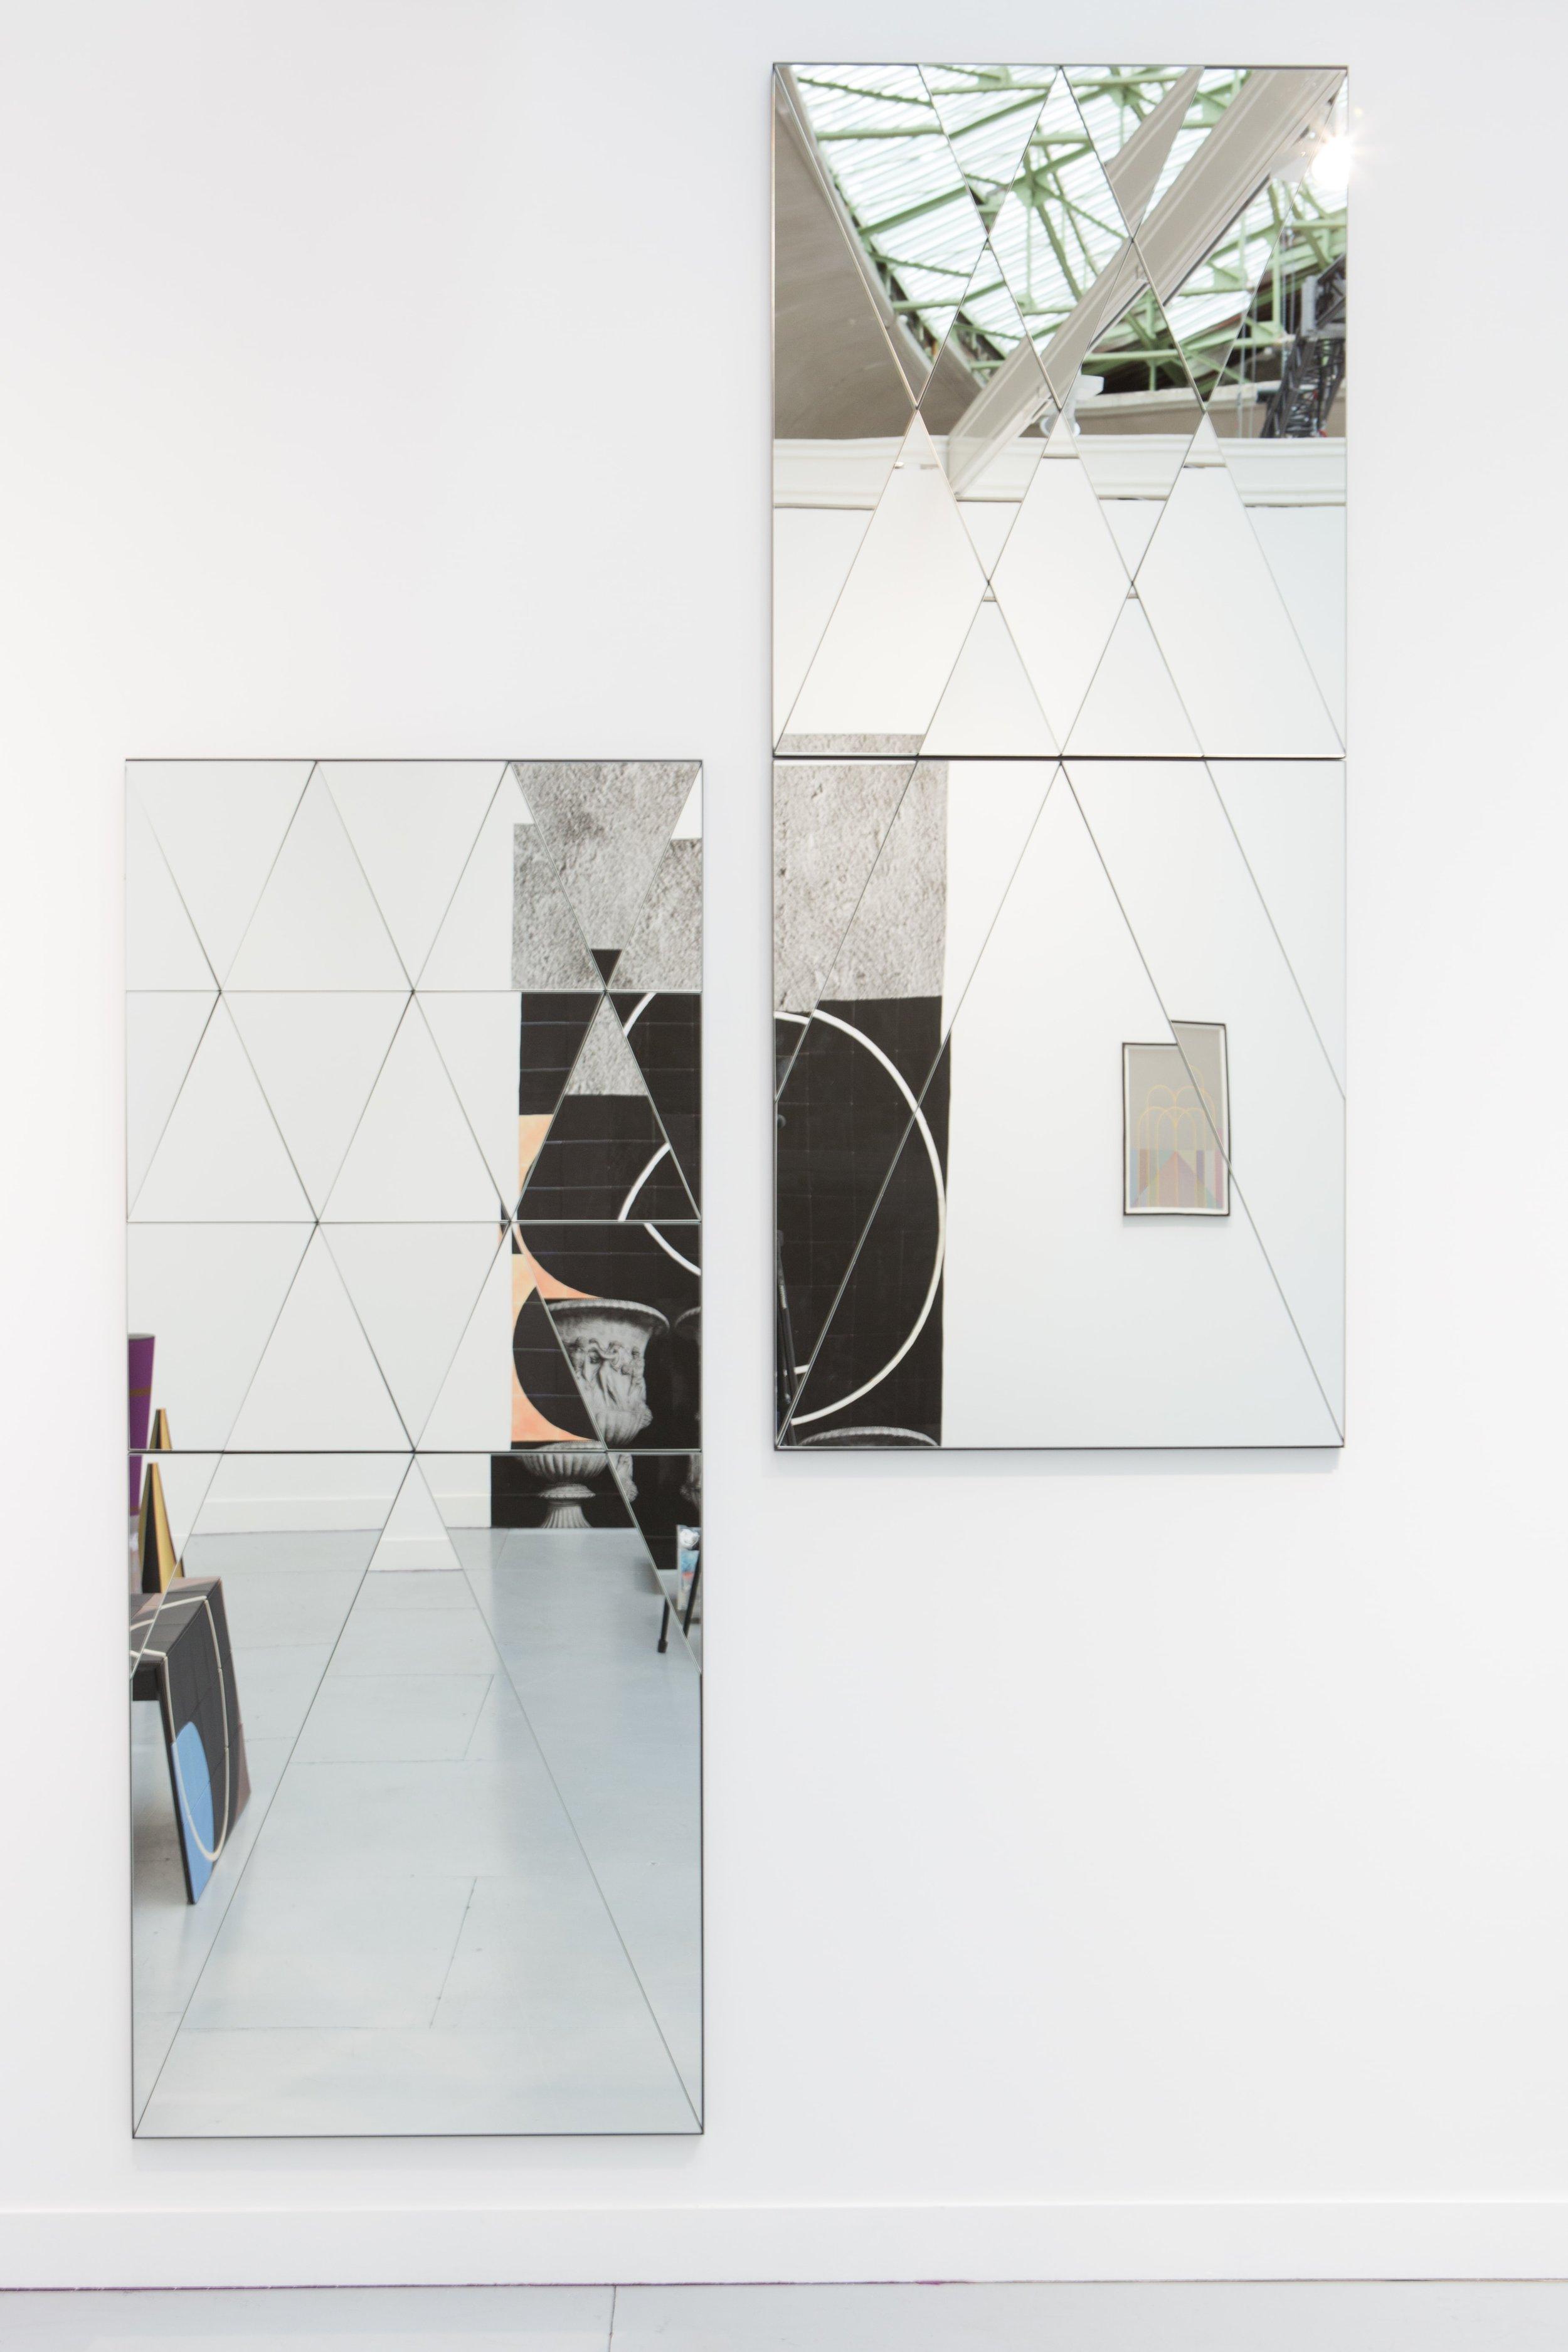 Claudia Wieser, 2015, untitled (mirror), mirror,182 cm x 76 cm x 3 cm, edition 1+2